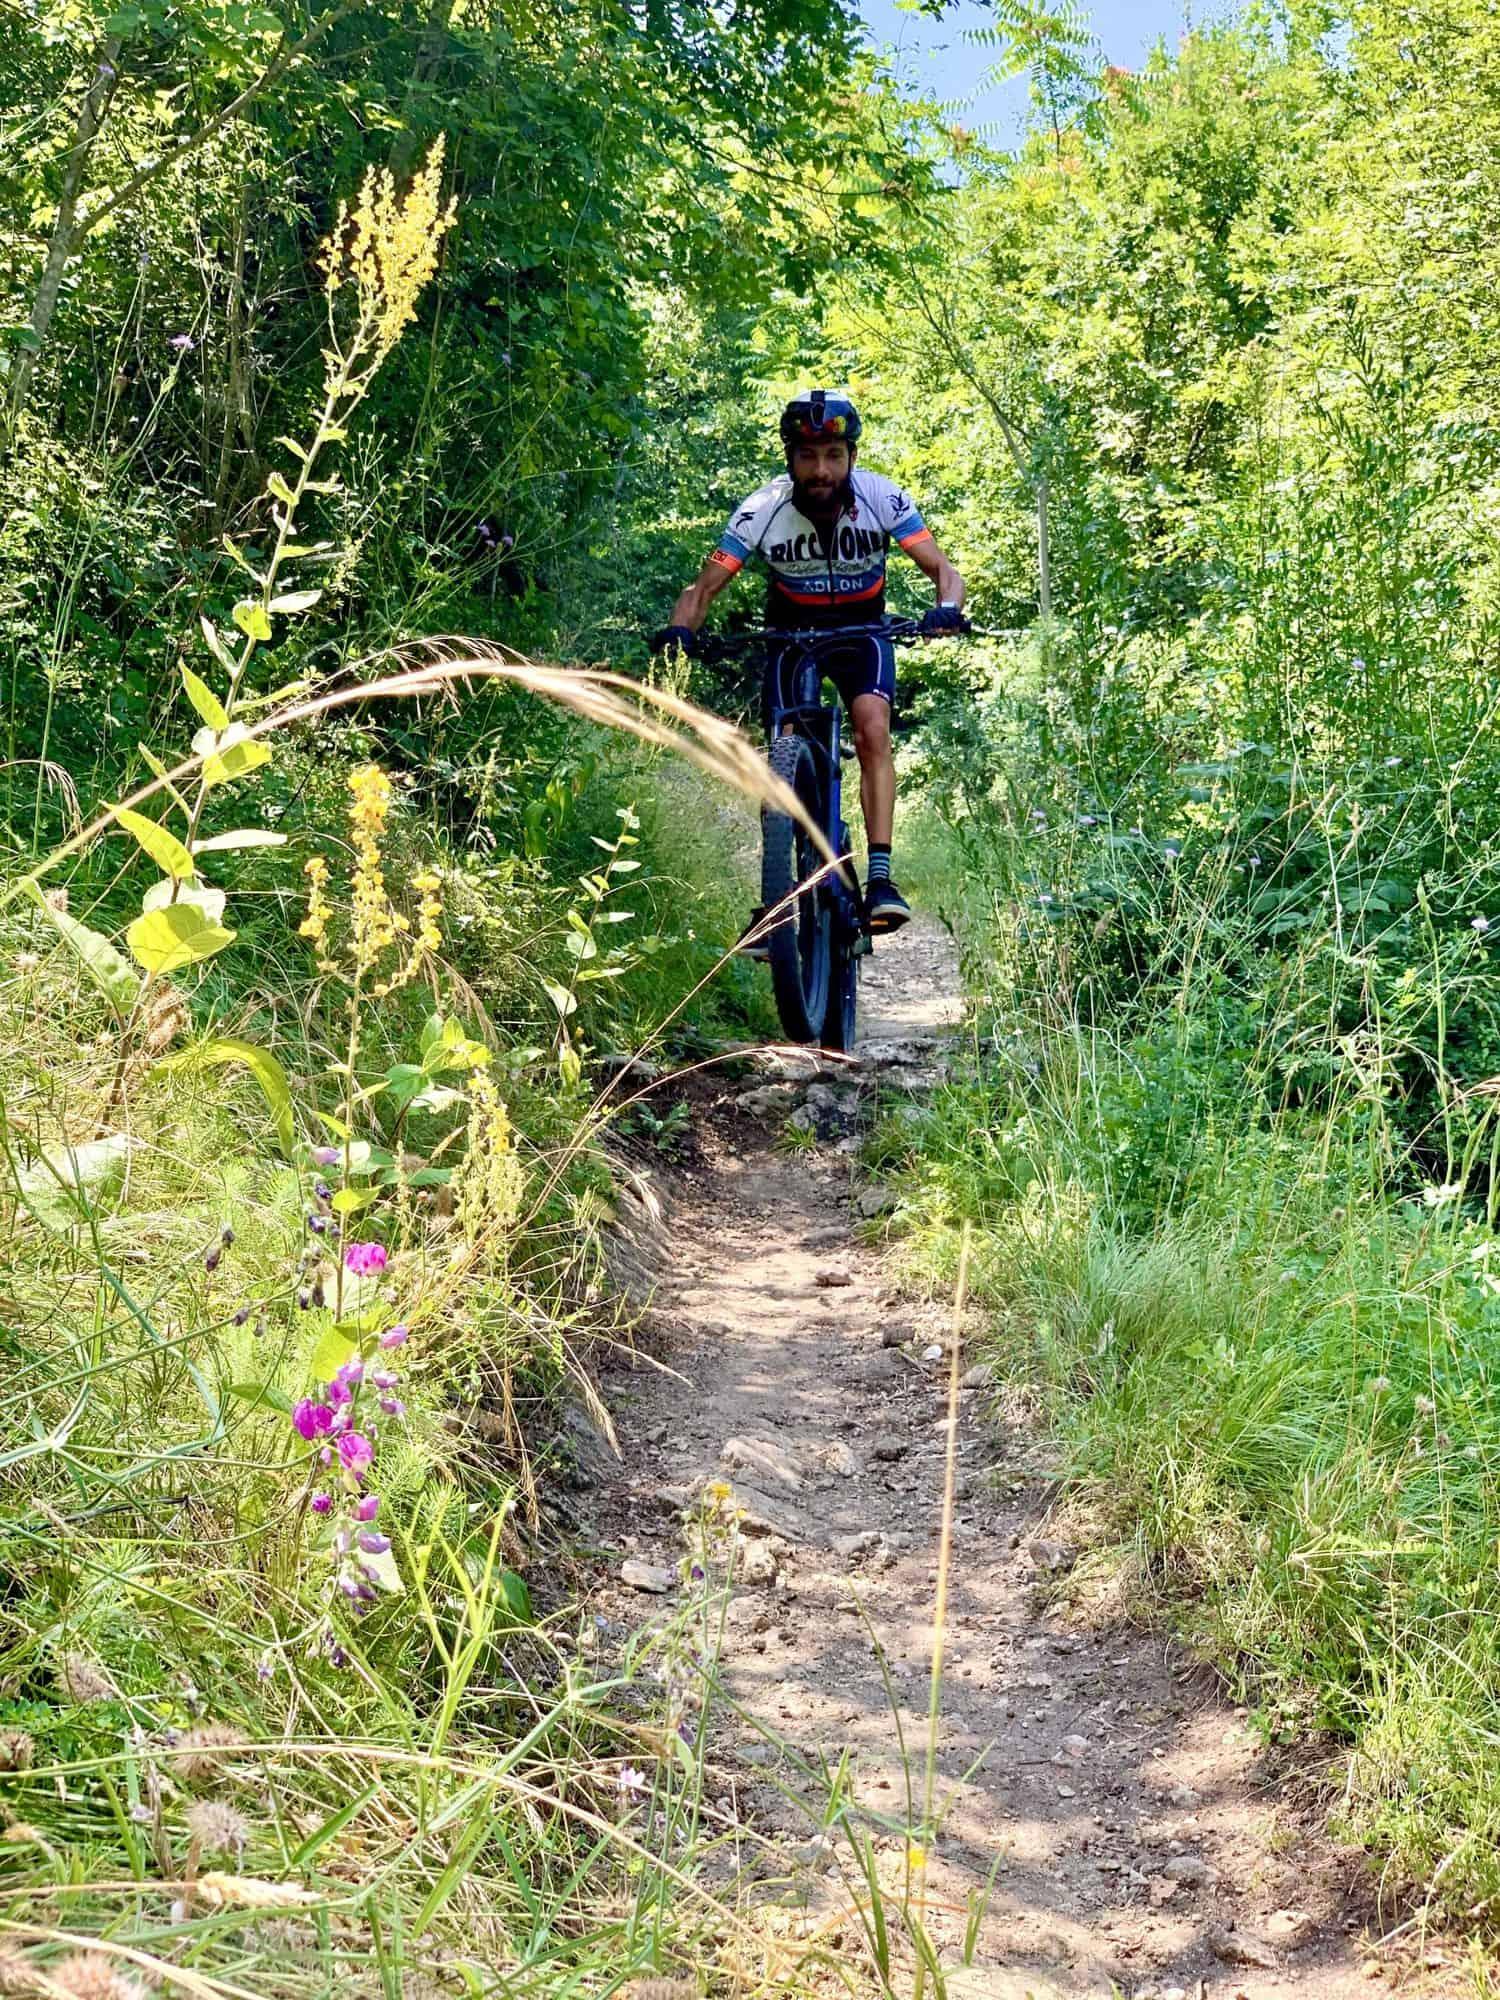 San Marino ebike e-bike mtb emtb guida istruttore mtb calanchi vigneti percorsi outdoor rimini montefeltro leo verucchio torriana